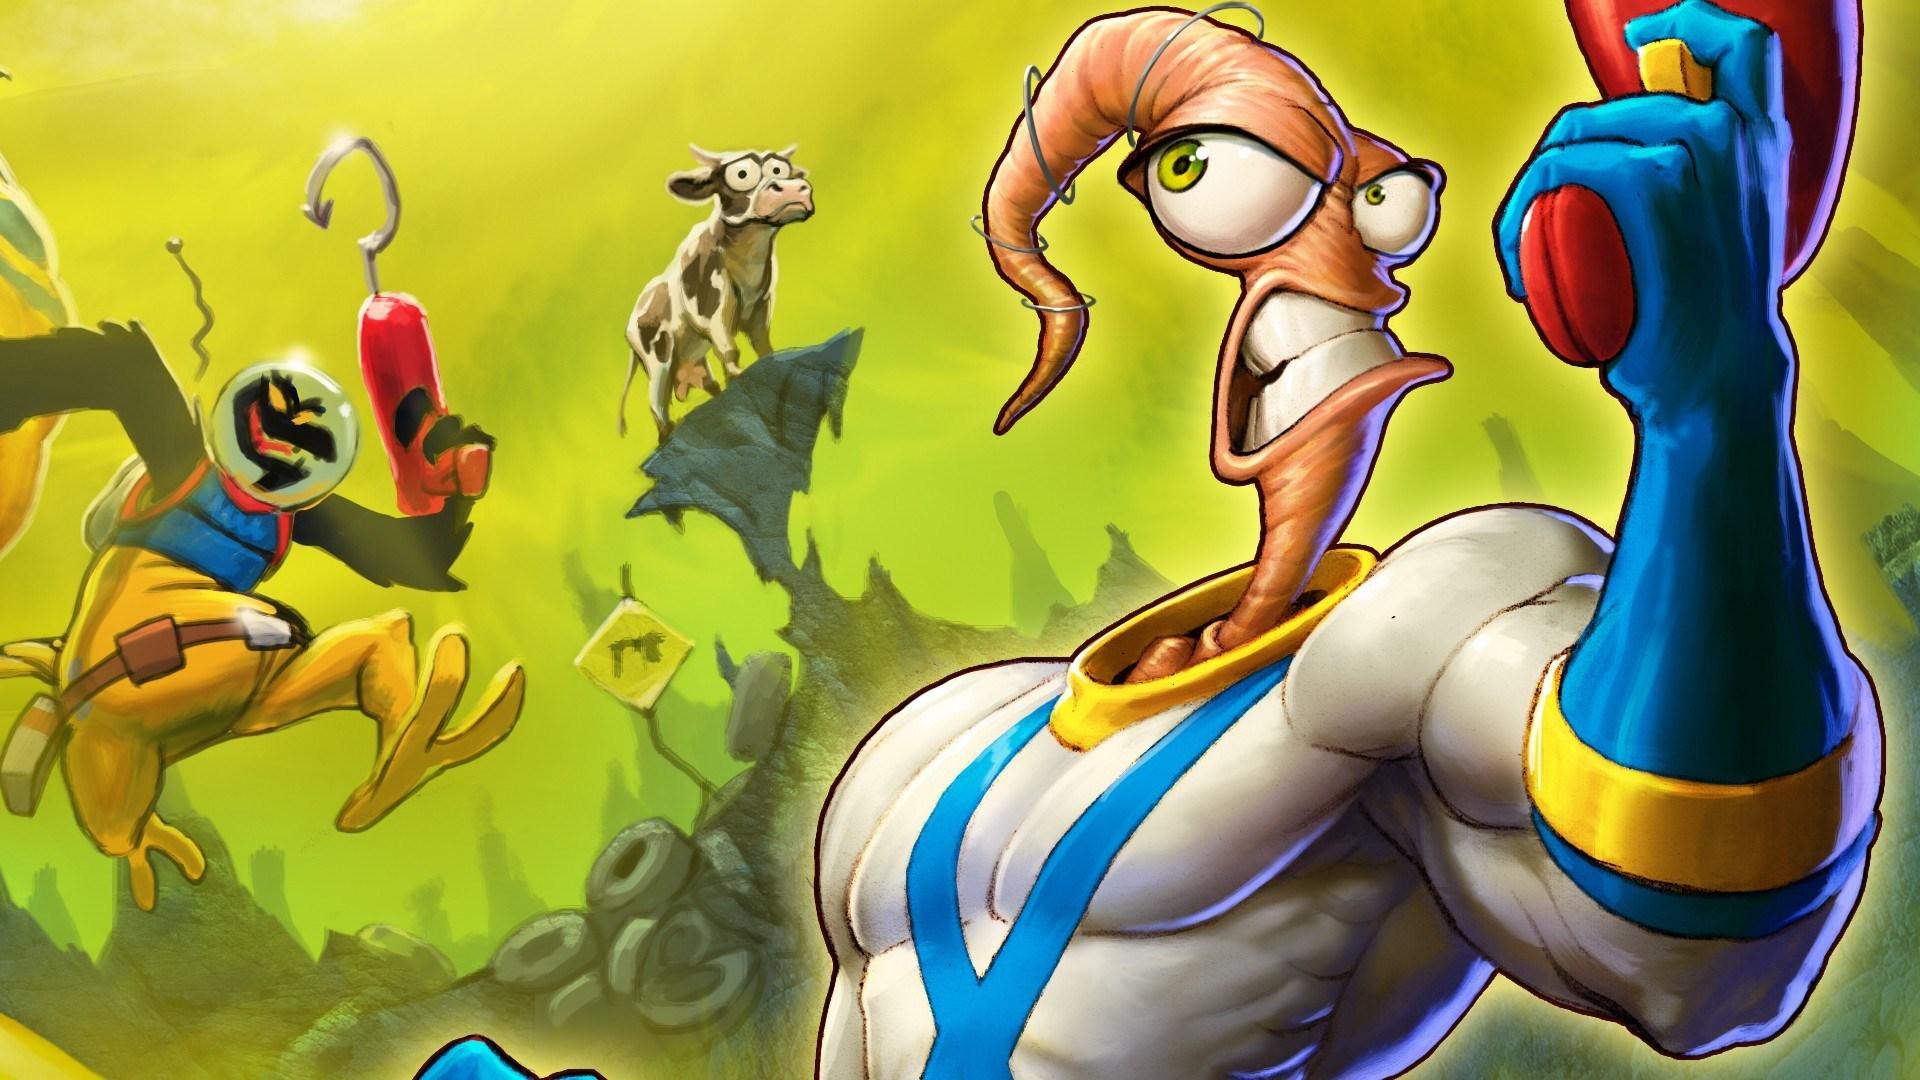 Earthworm Jim - Interplay